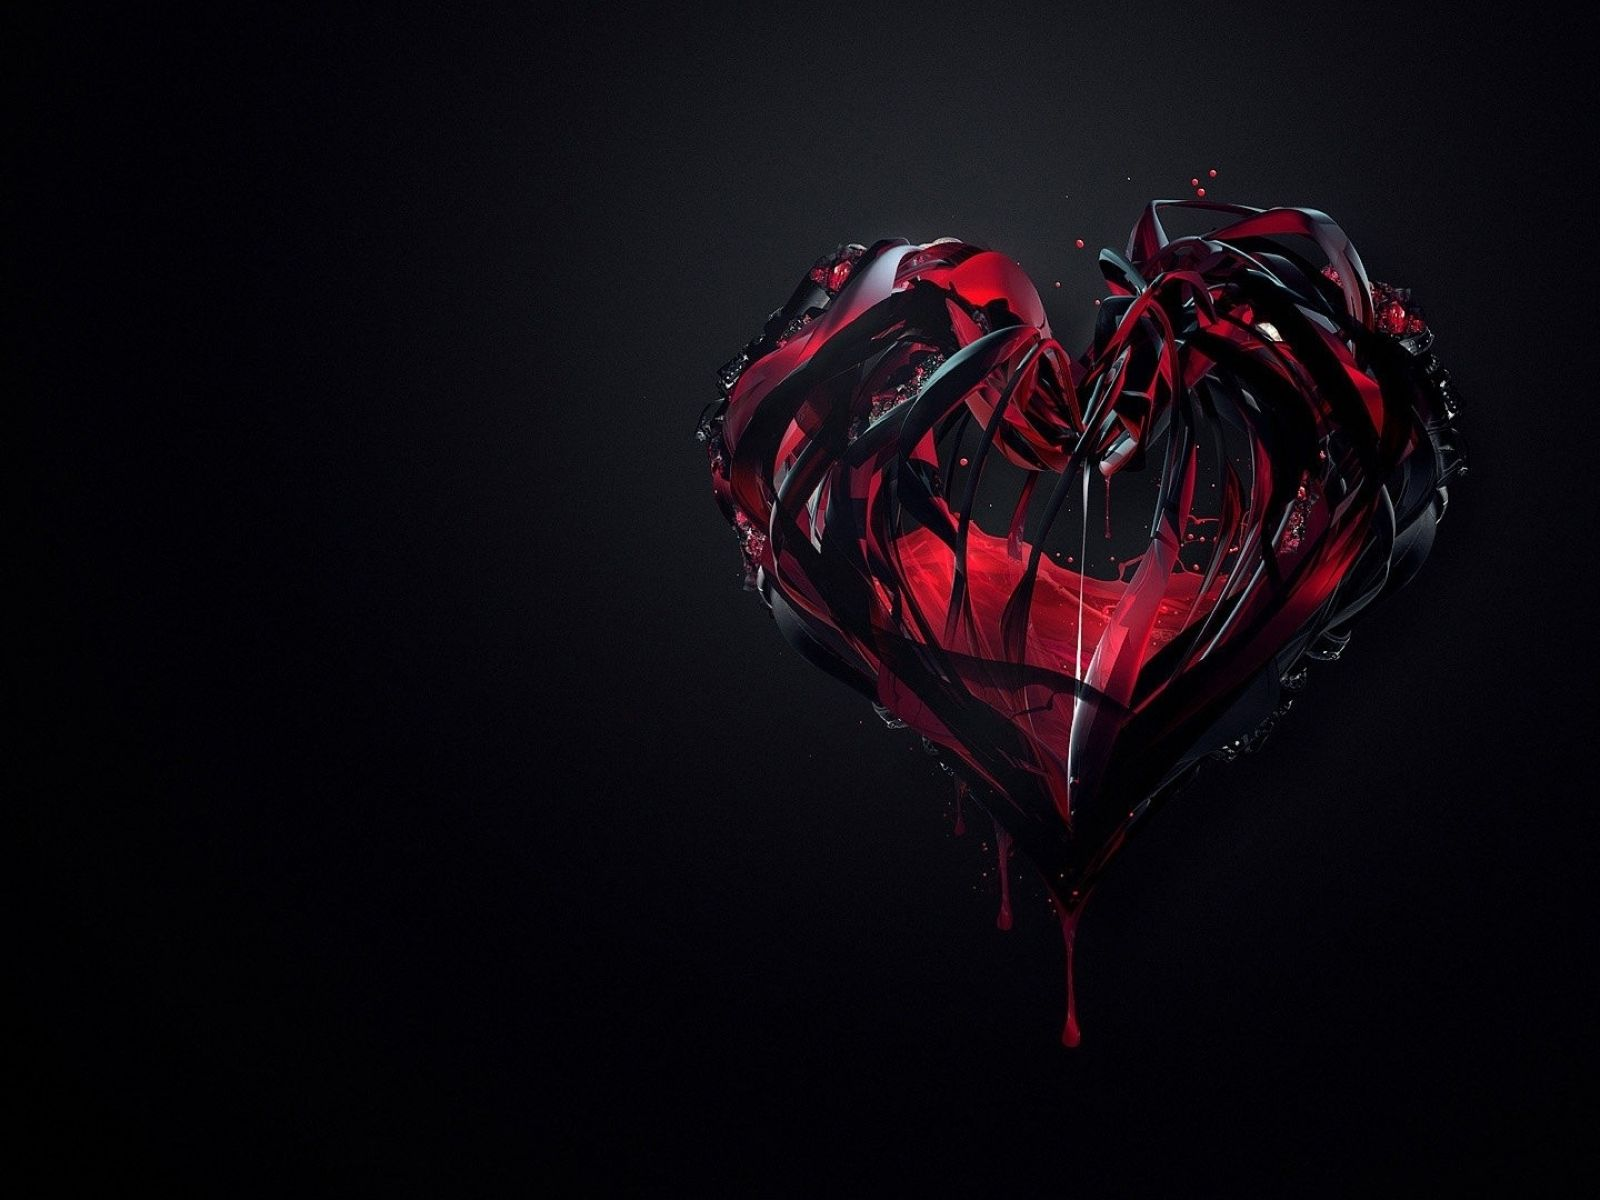 Black Roses With Blood Black Red Blood Drops Artwork Hearts Black